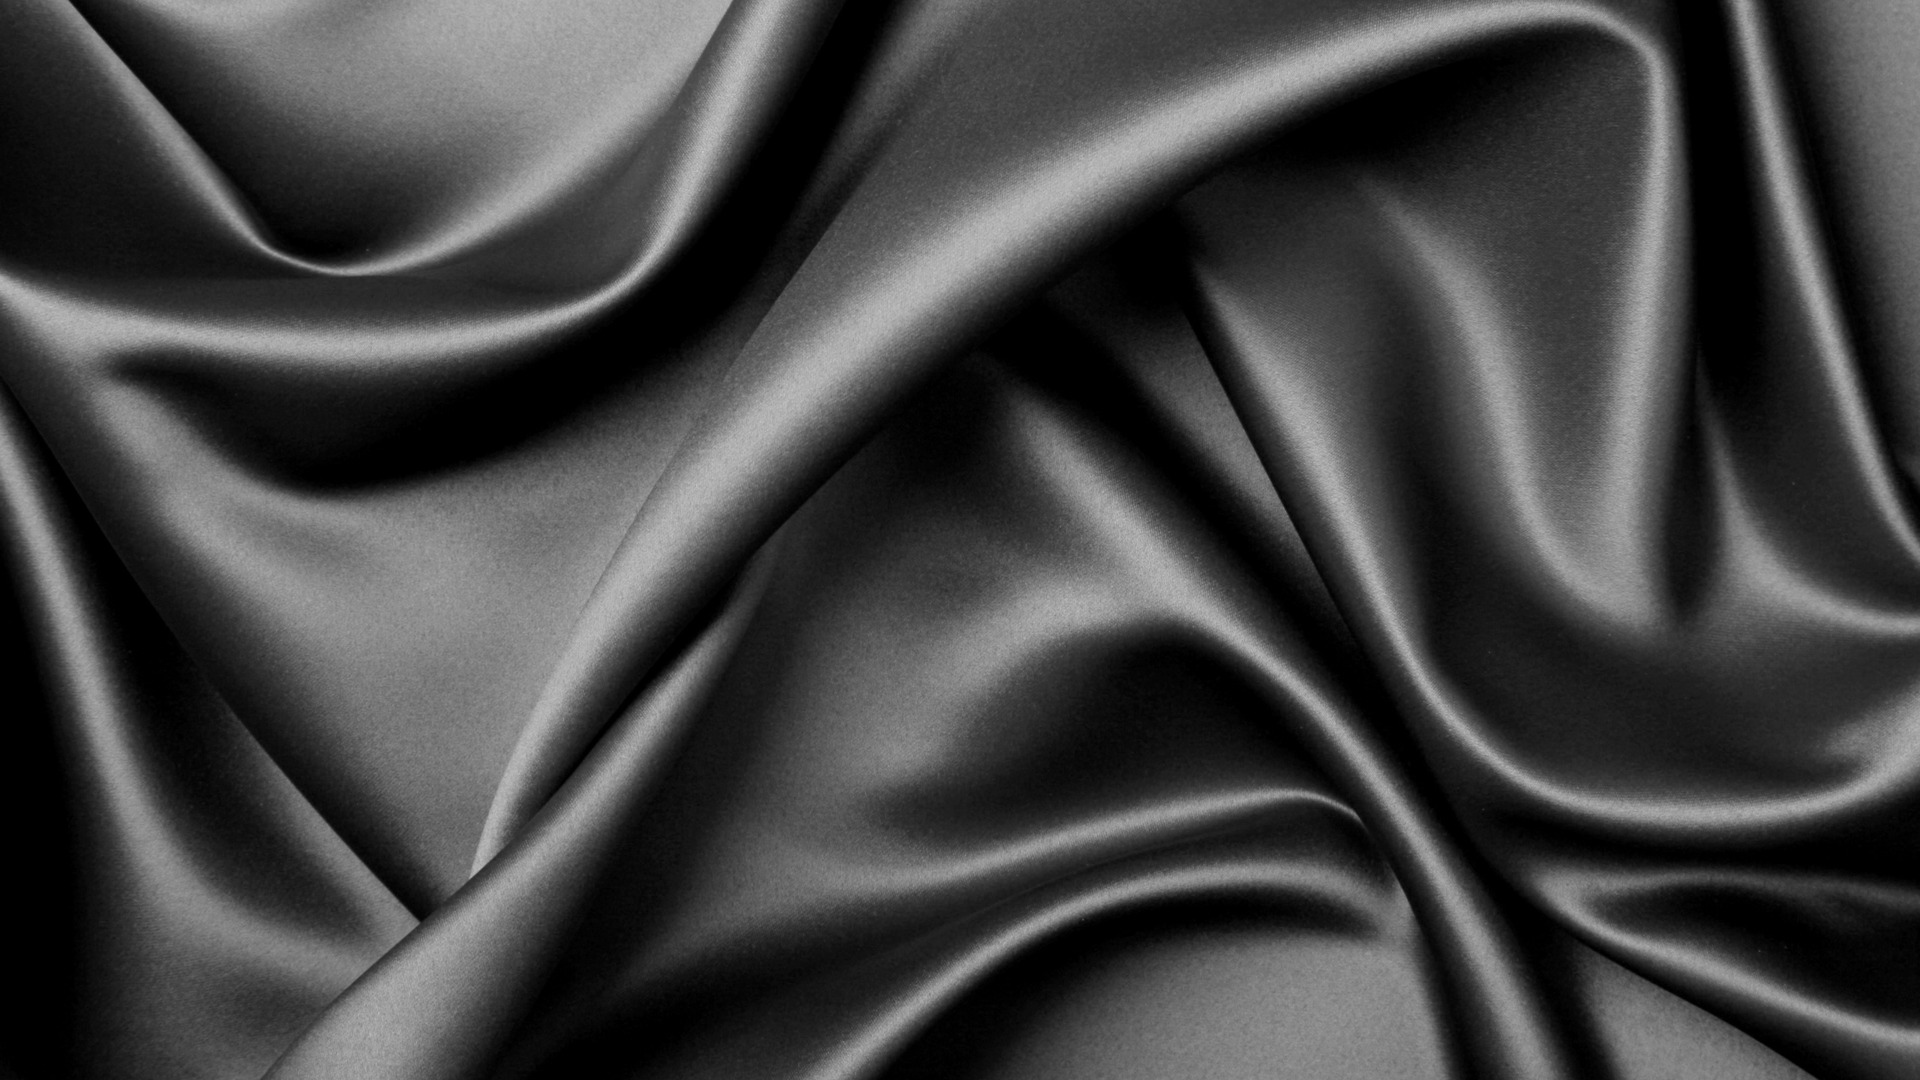 Download texture black silk fabric cloth background texture 1920x1080